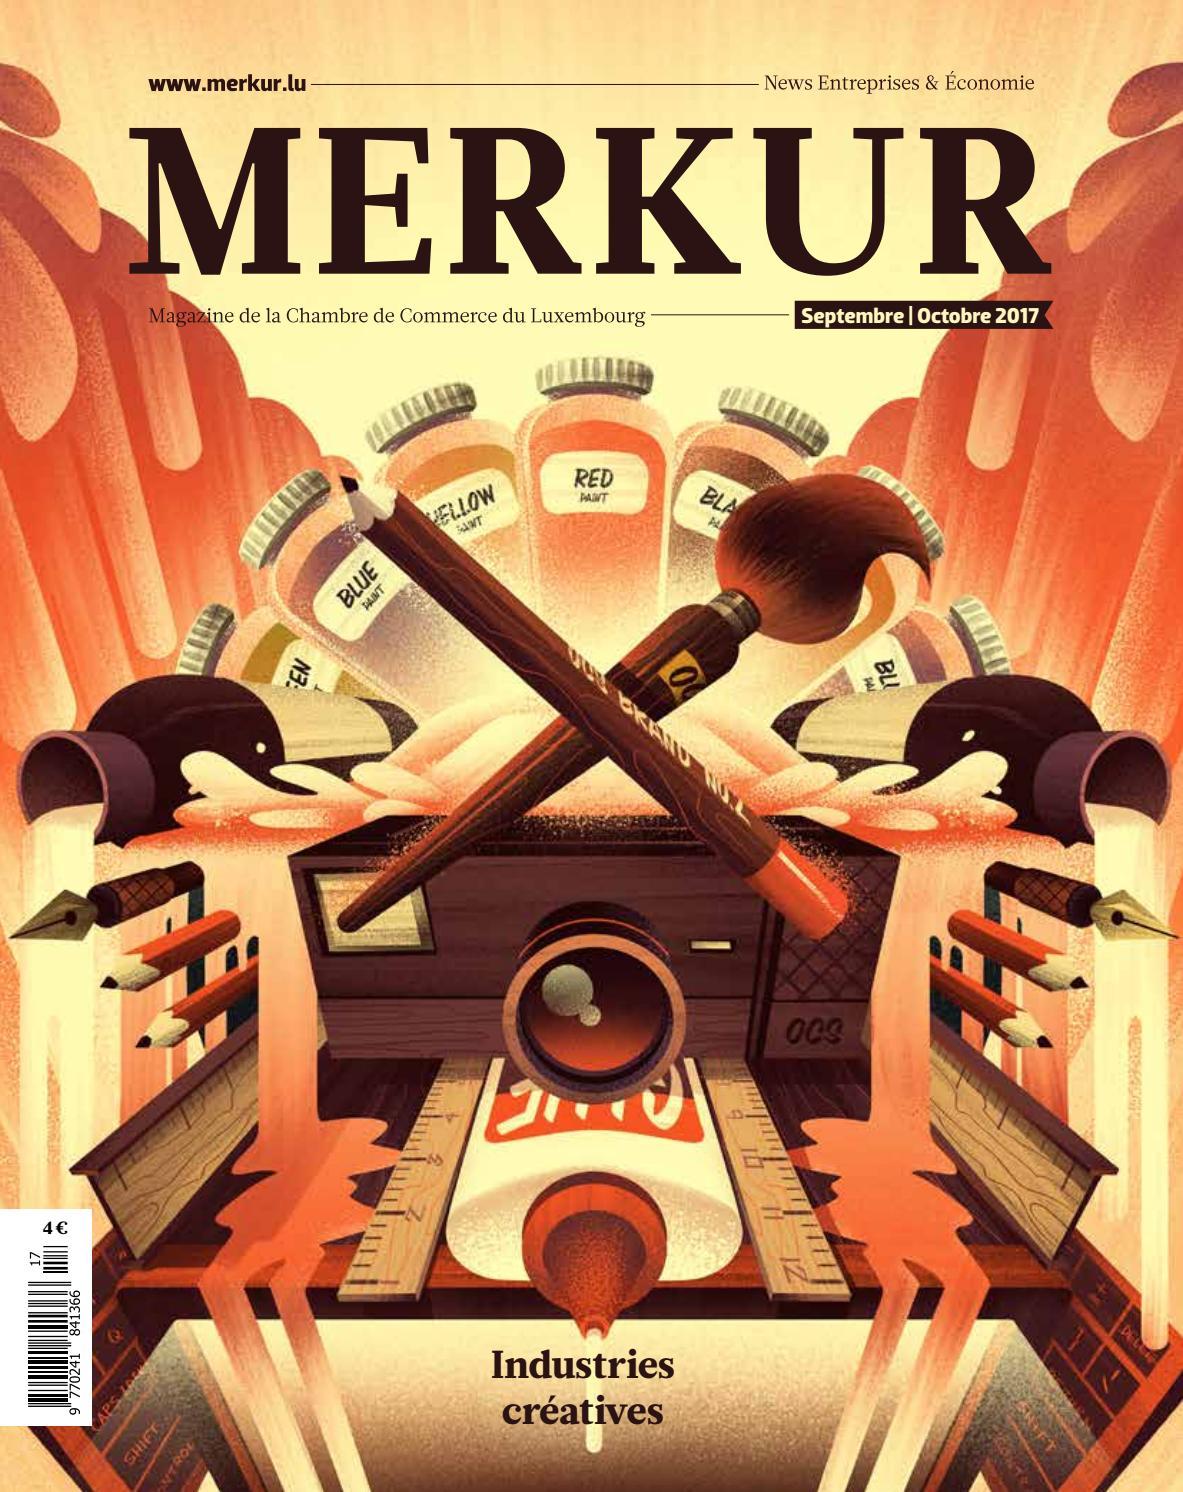 Merkur Septembre Octobre 2017 by Maison Moderne - issuu 2a842df526bd